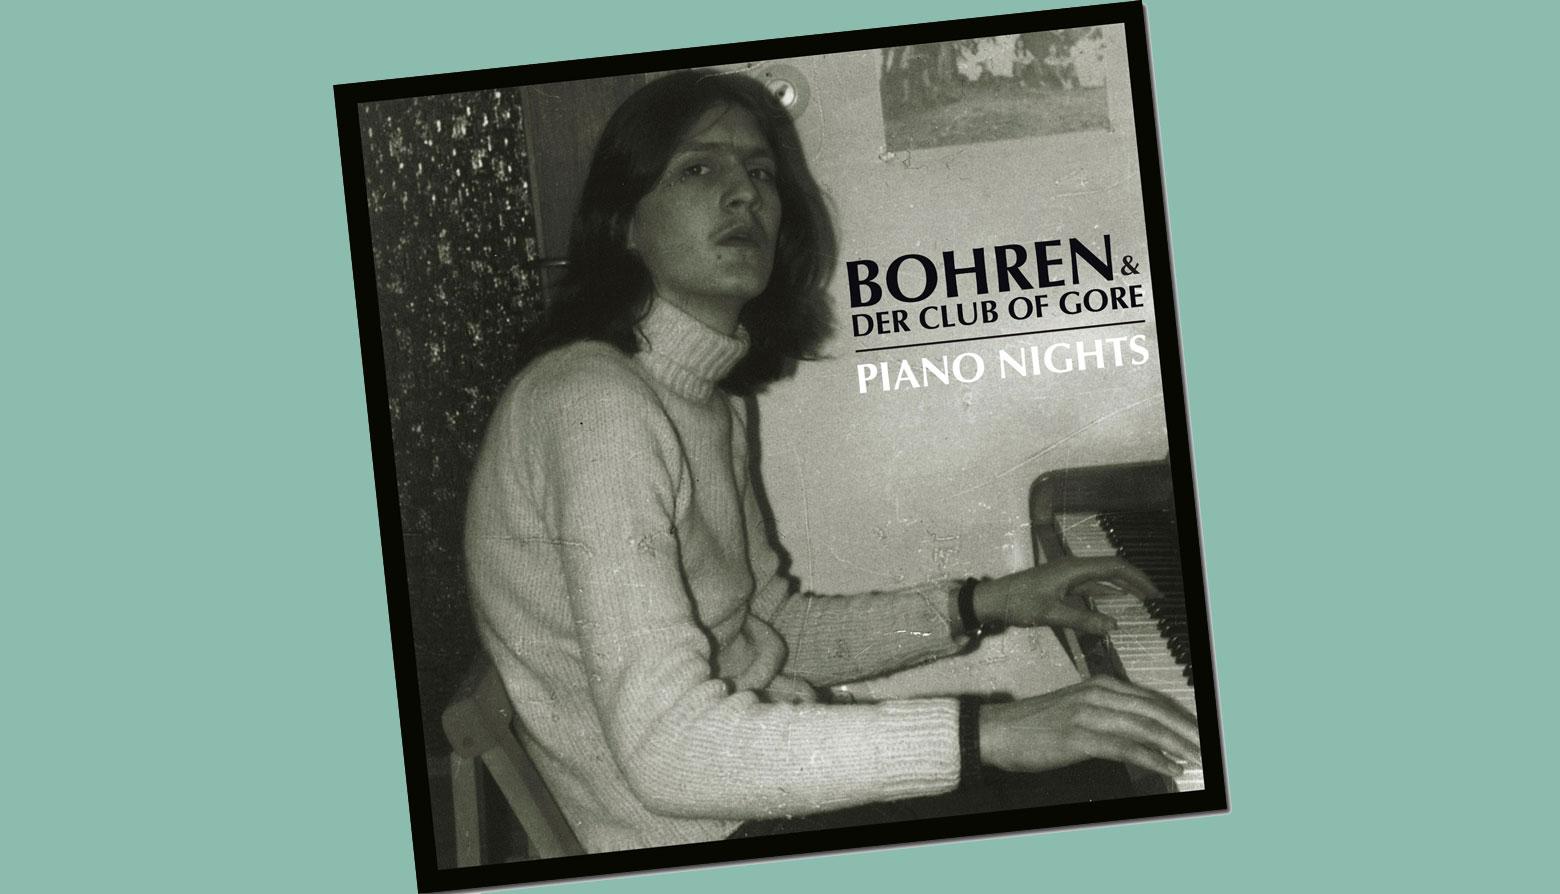 bohren-der-club-of-gore-piano-nights